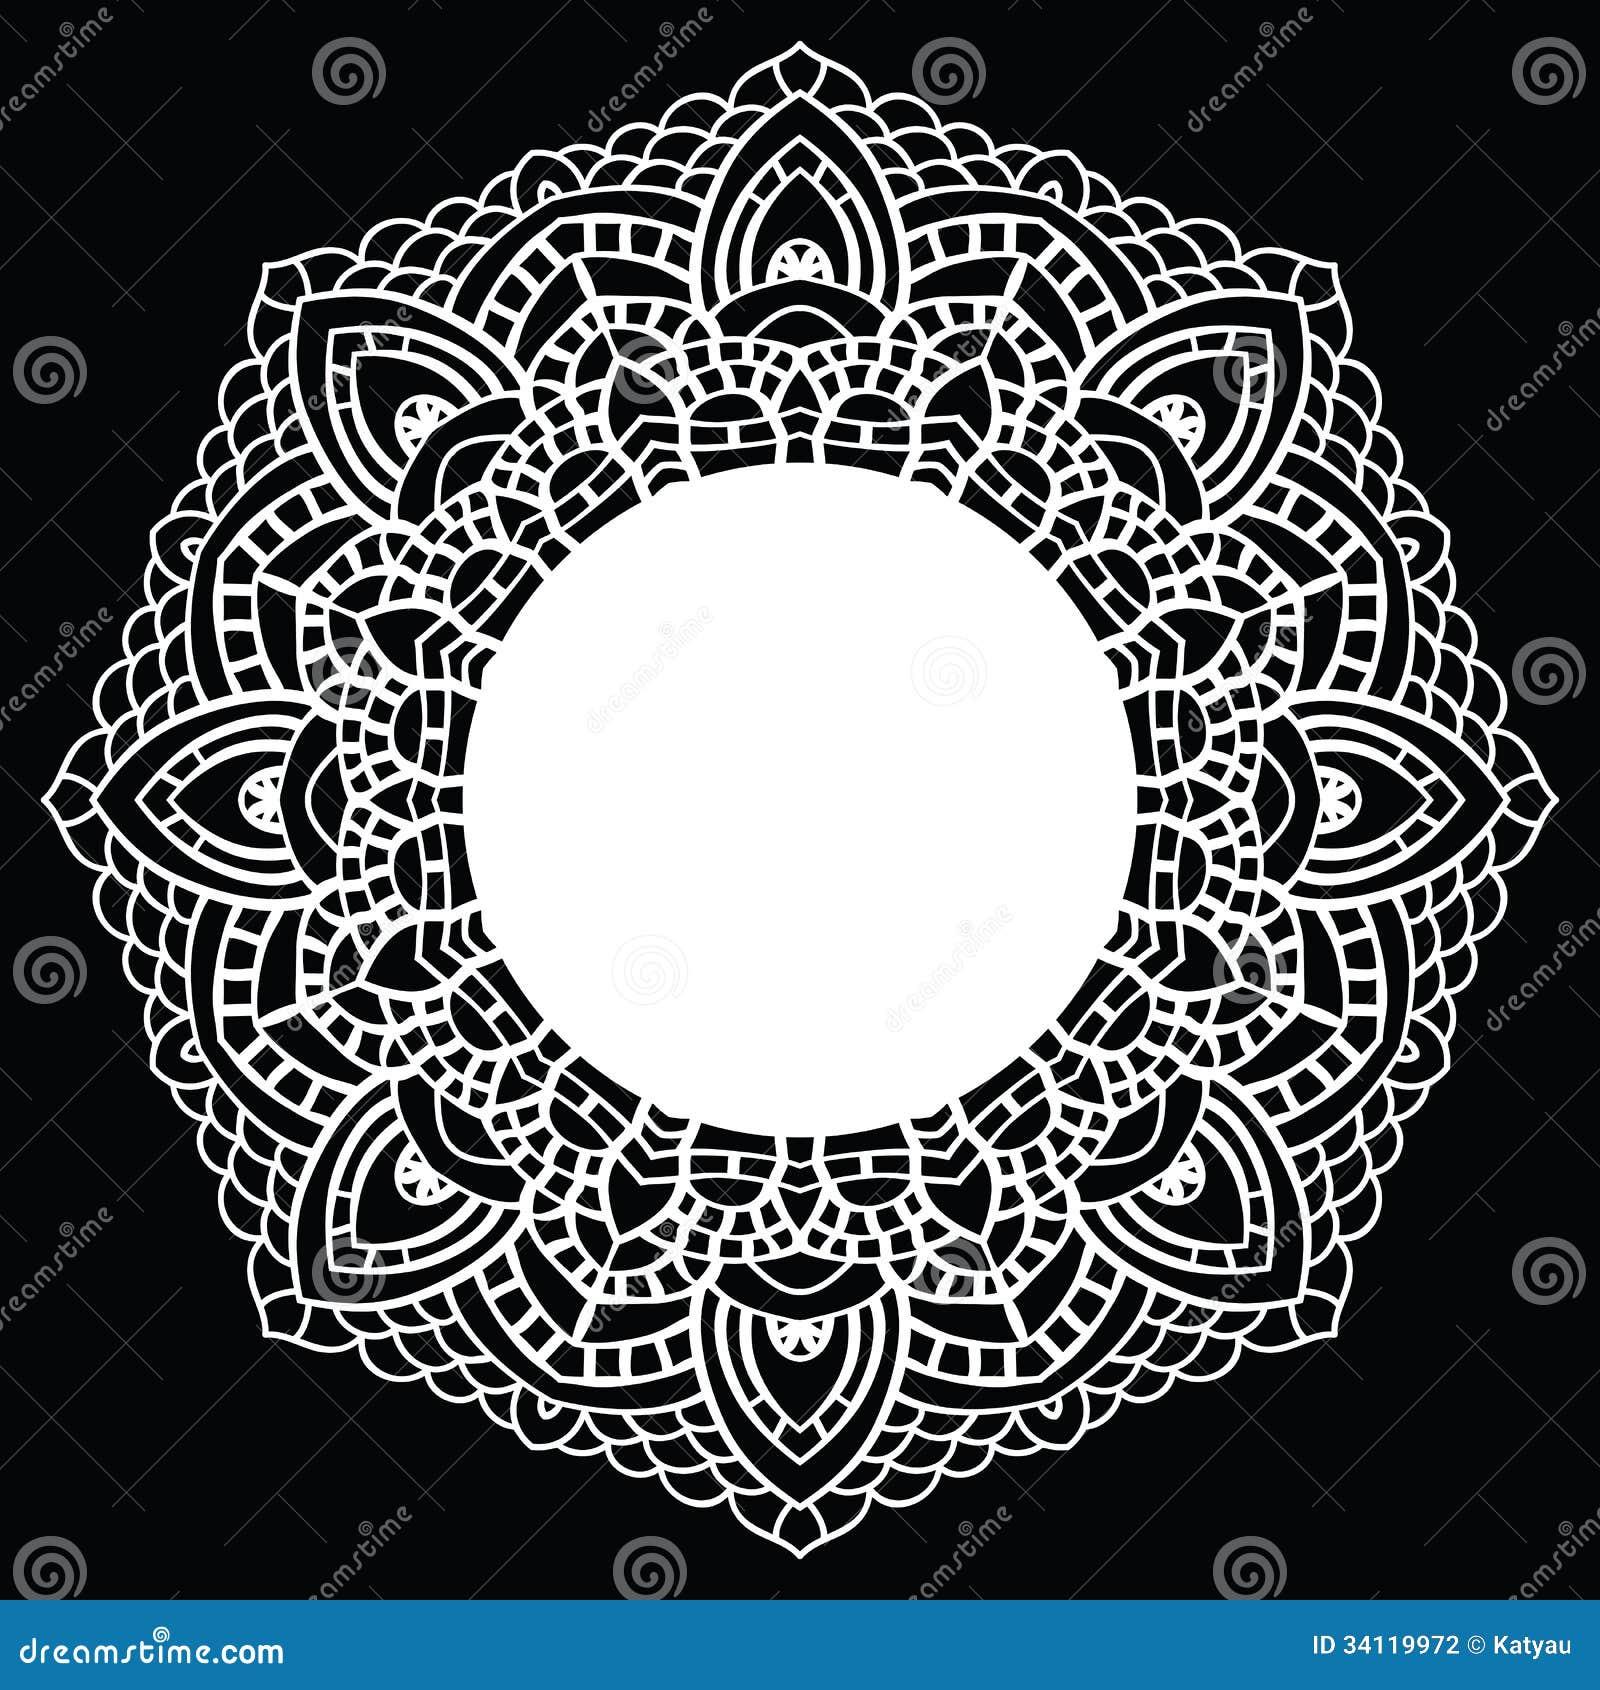 Crochet Patterns Vector : Crochet Lace Mandala. Stock Photography - Image: 34119972